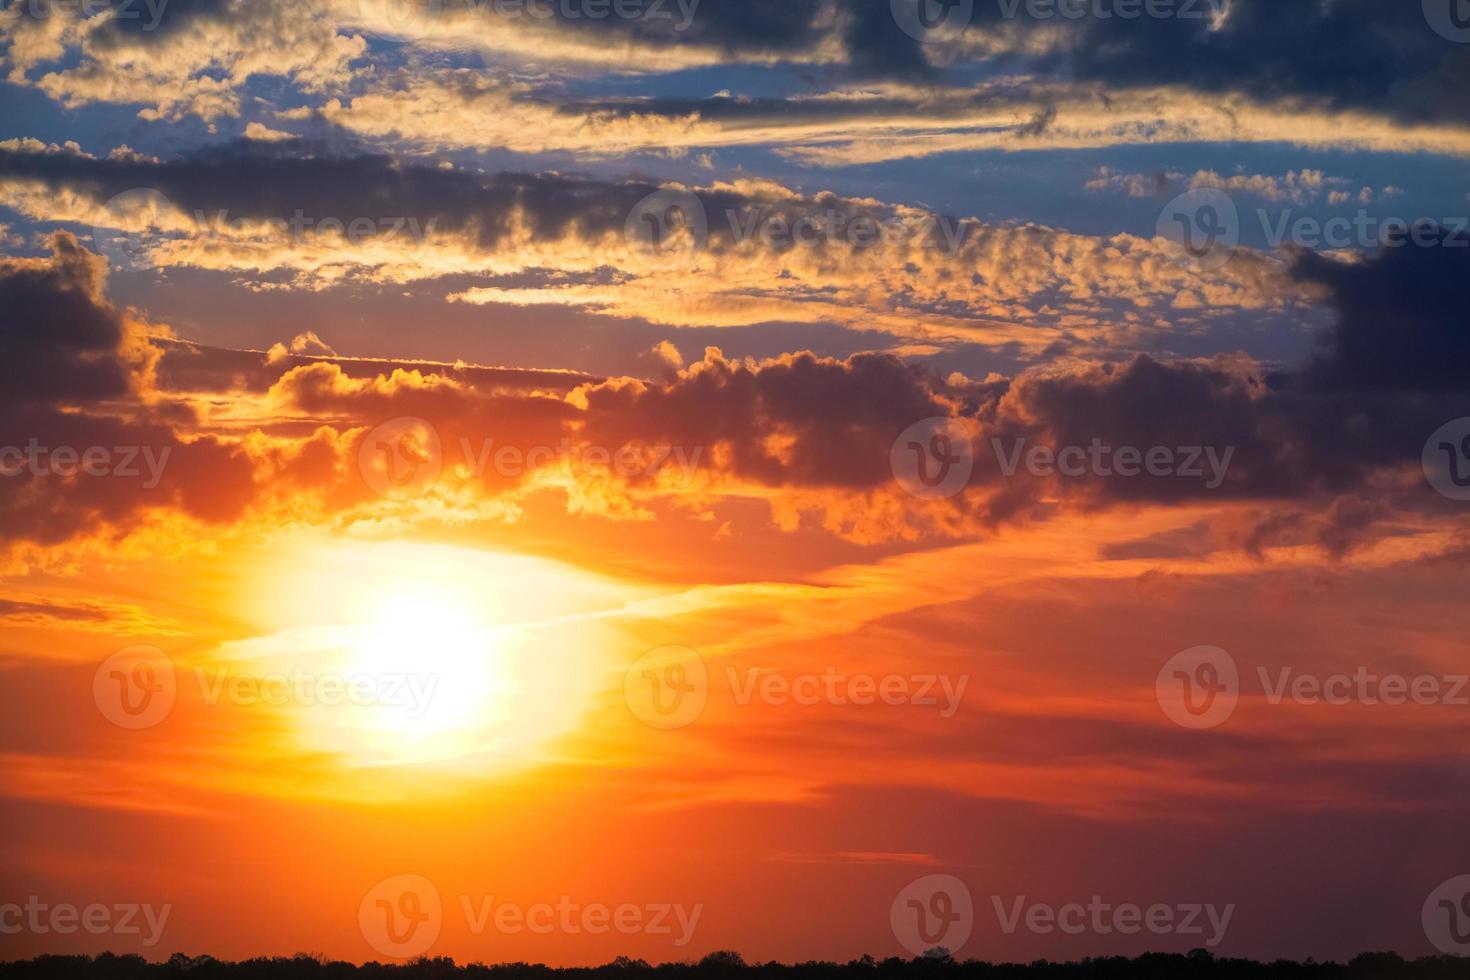 feuriger Sonnenuntergang. Schöner Himmel. foto